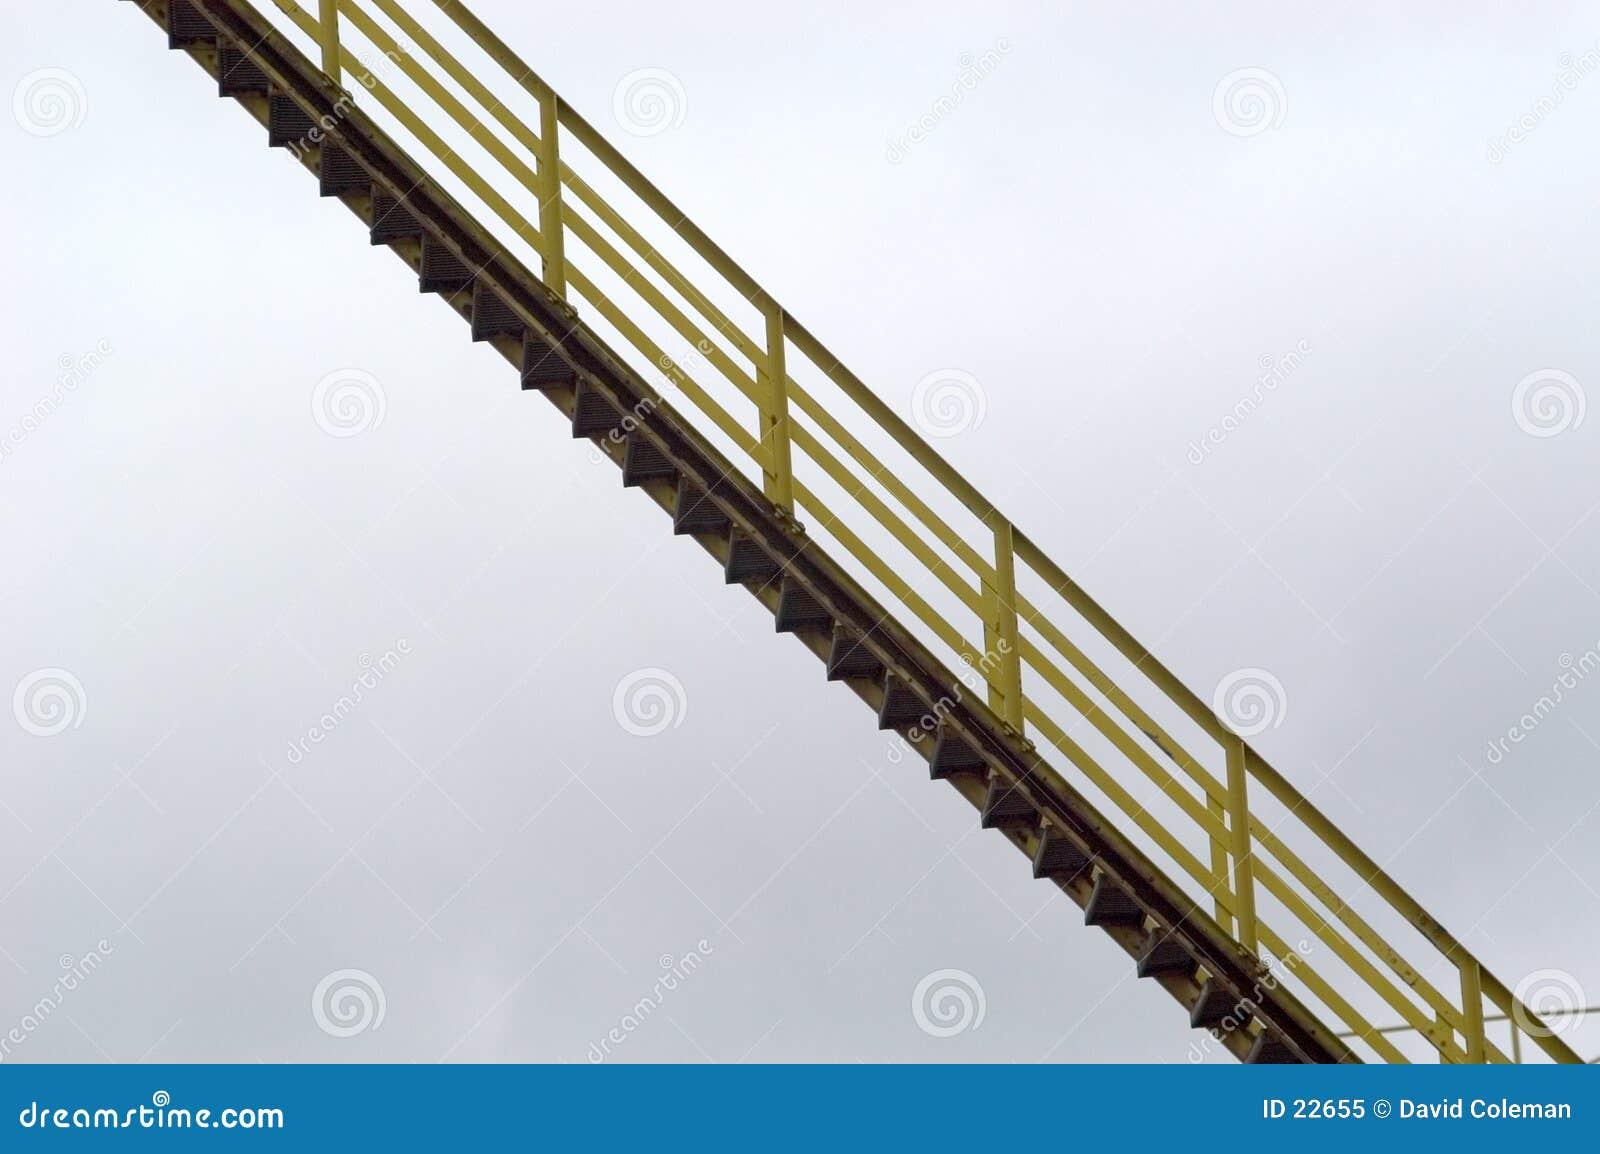 Suspended Stairway